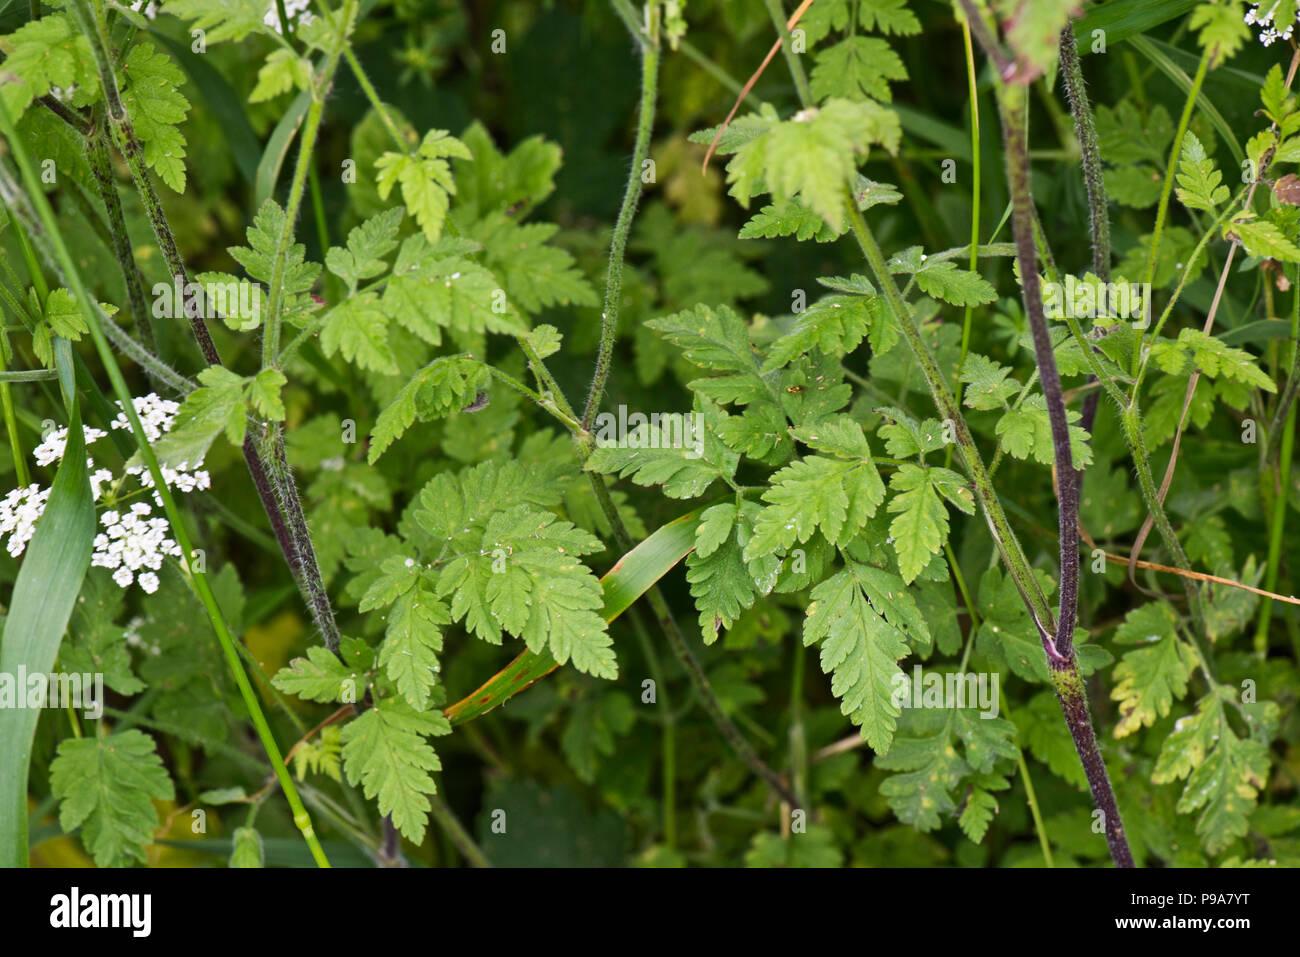 Rough chervil, Chaerophyllim  temulum, leaves and rough hairy purple stems, Berkshire, June - Stock Image